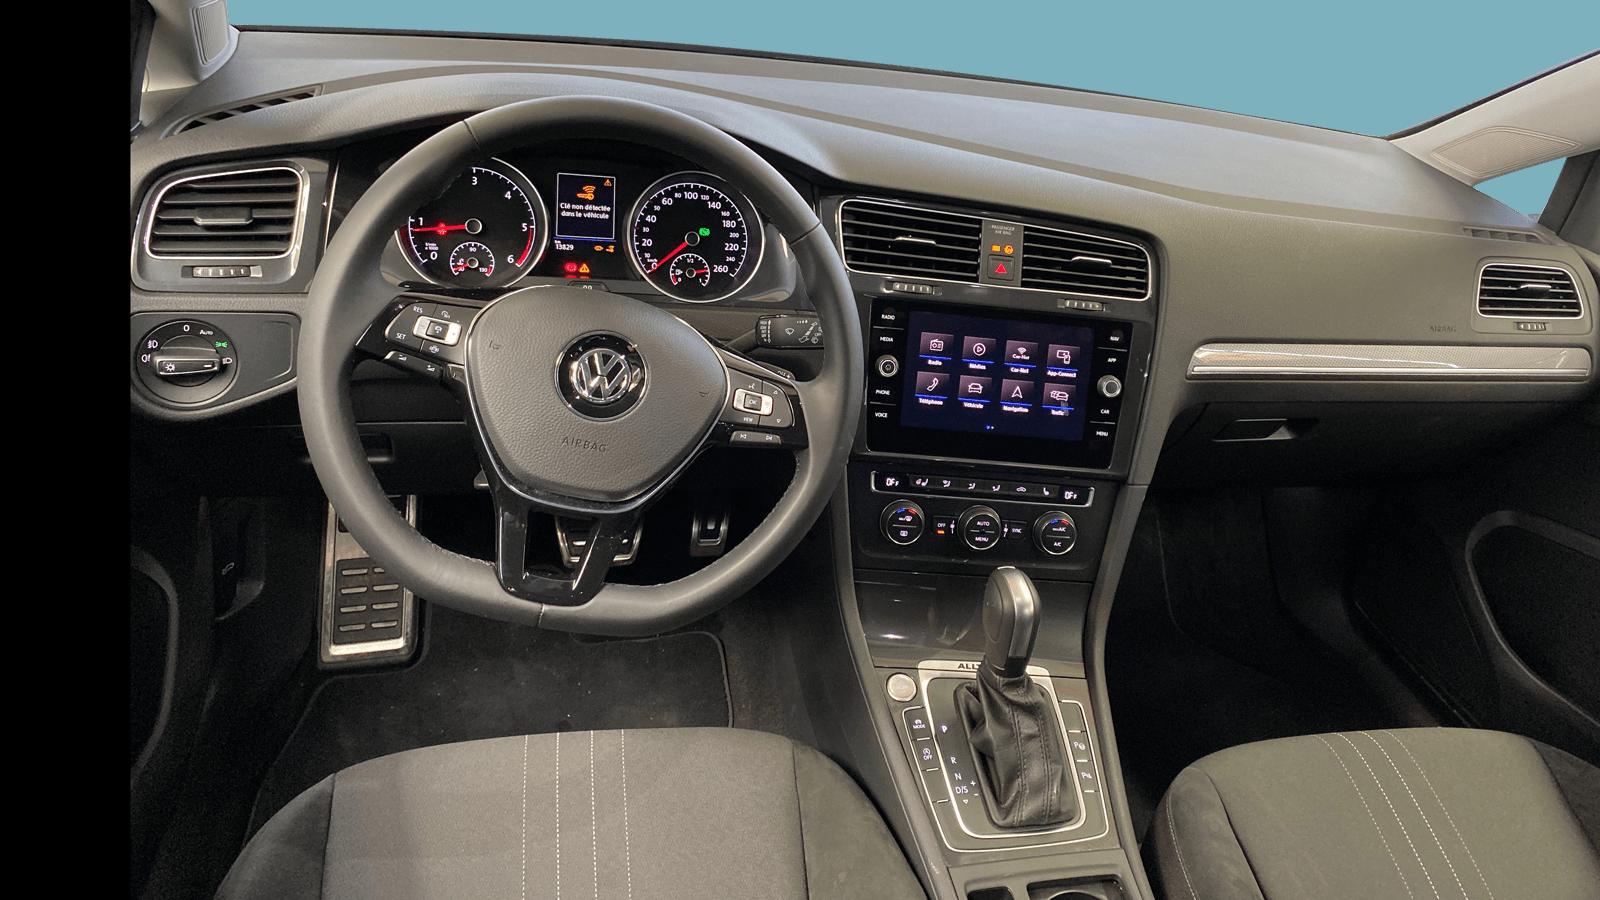 VW Golf Variant Alltrack Schwarz interior - Clyde Auto-Abo